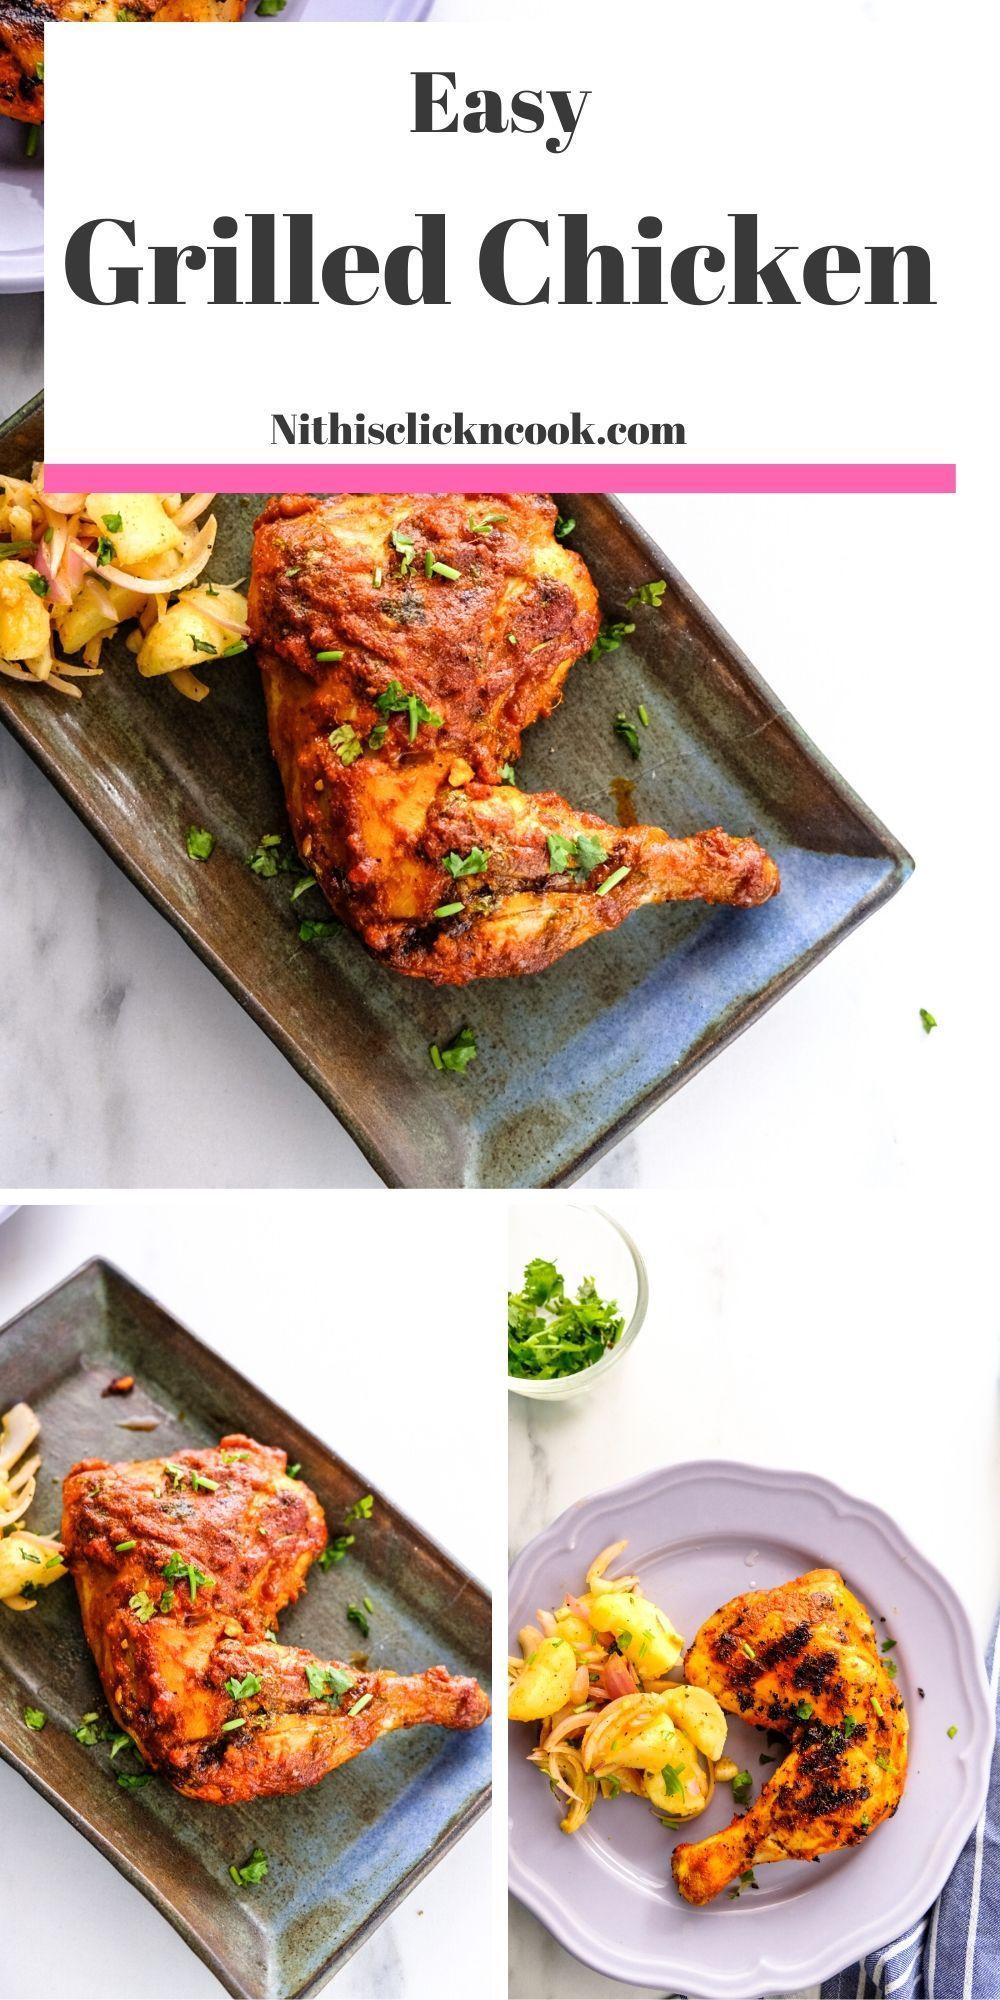 Grilled Chicken Recipe Recipe Grilled Chicken Recipes Easy Grilled Chicken Recipes Chicken Recipes